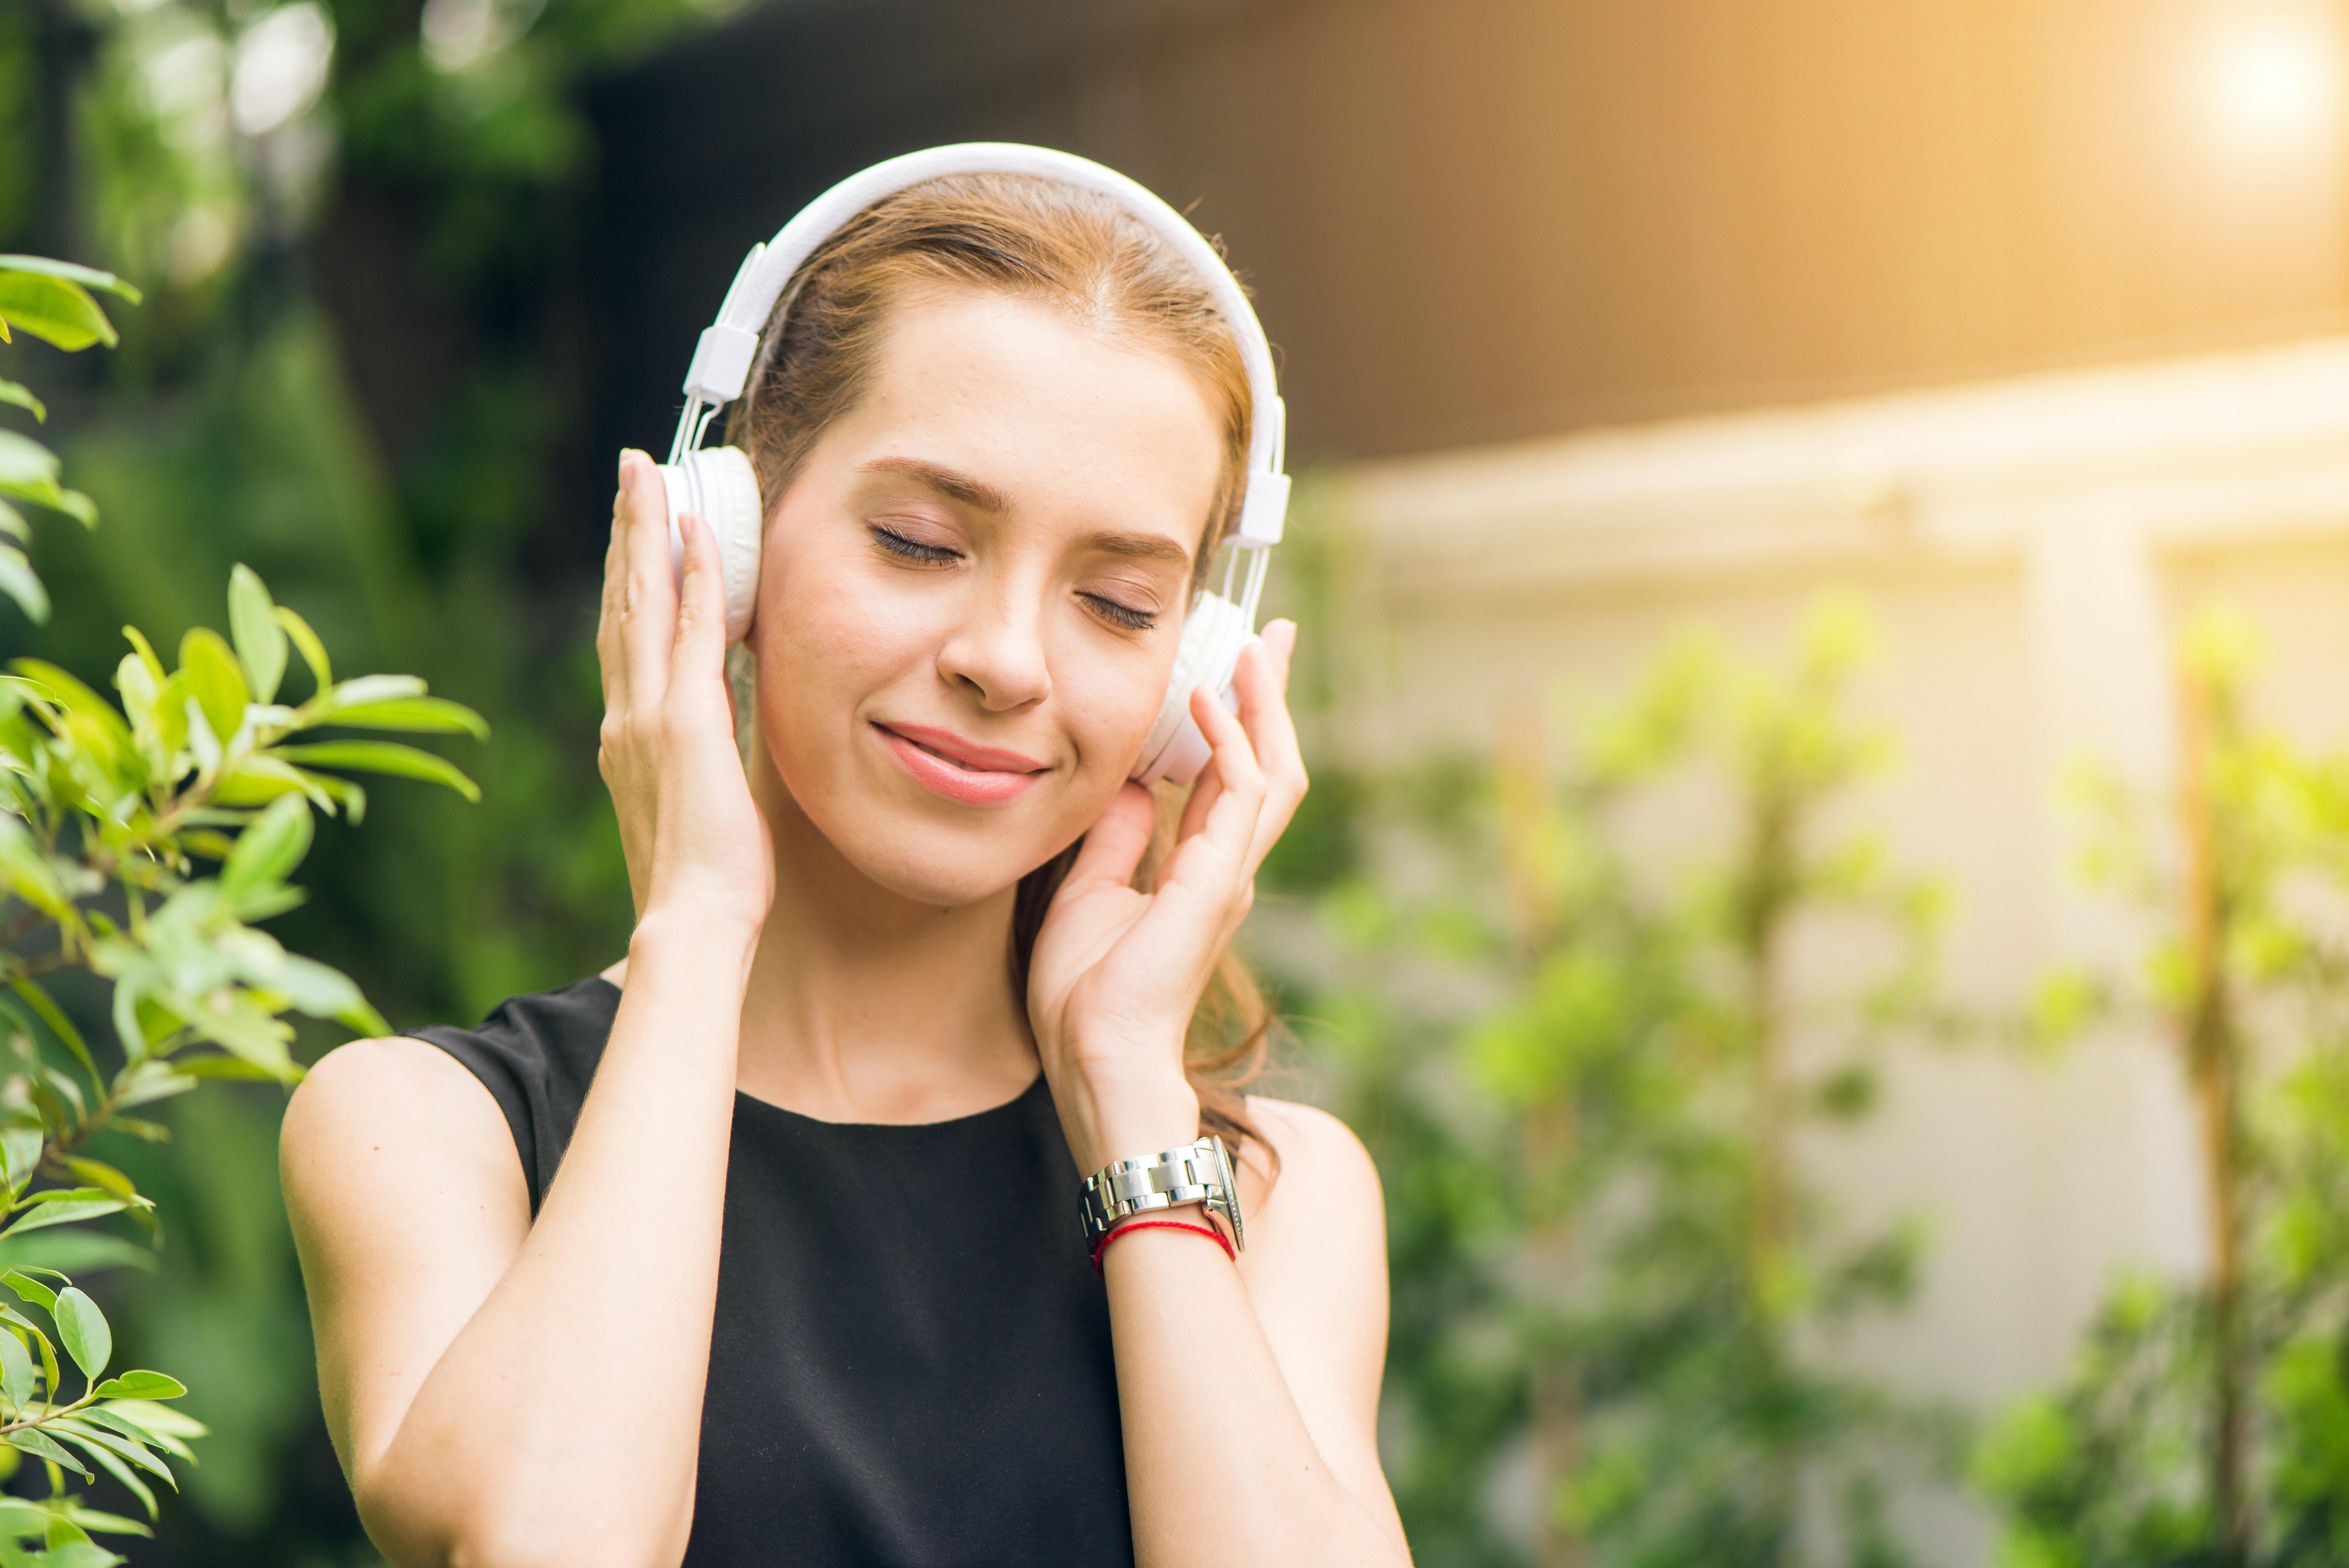 a9f0f0b8b50 Woman Wearing Black Sleeveless Dress Holding White Headphone at ...